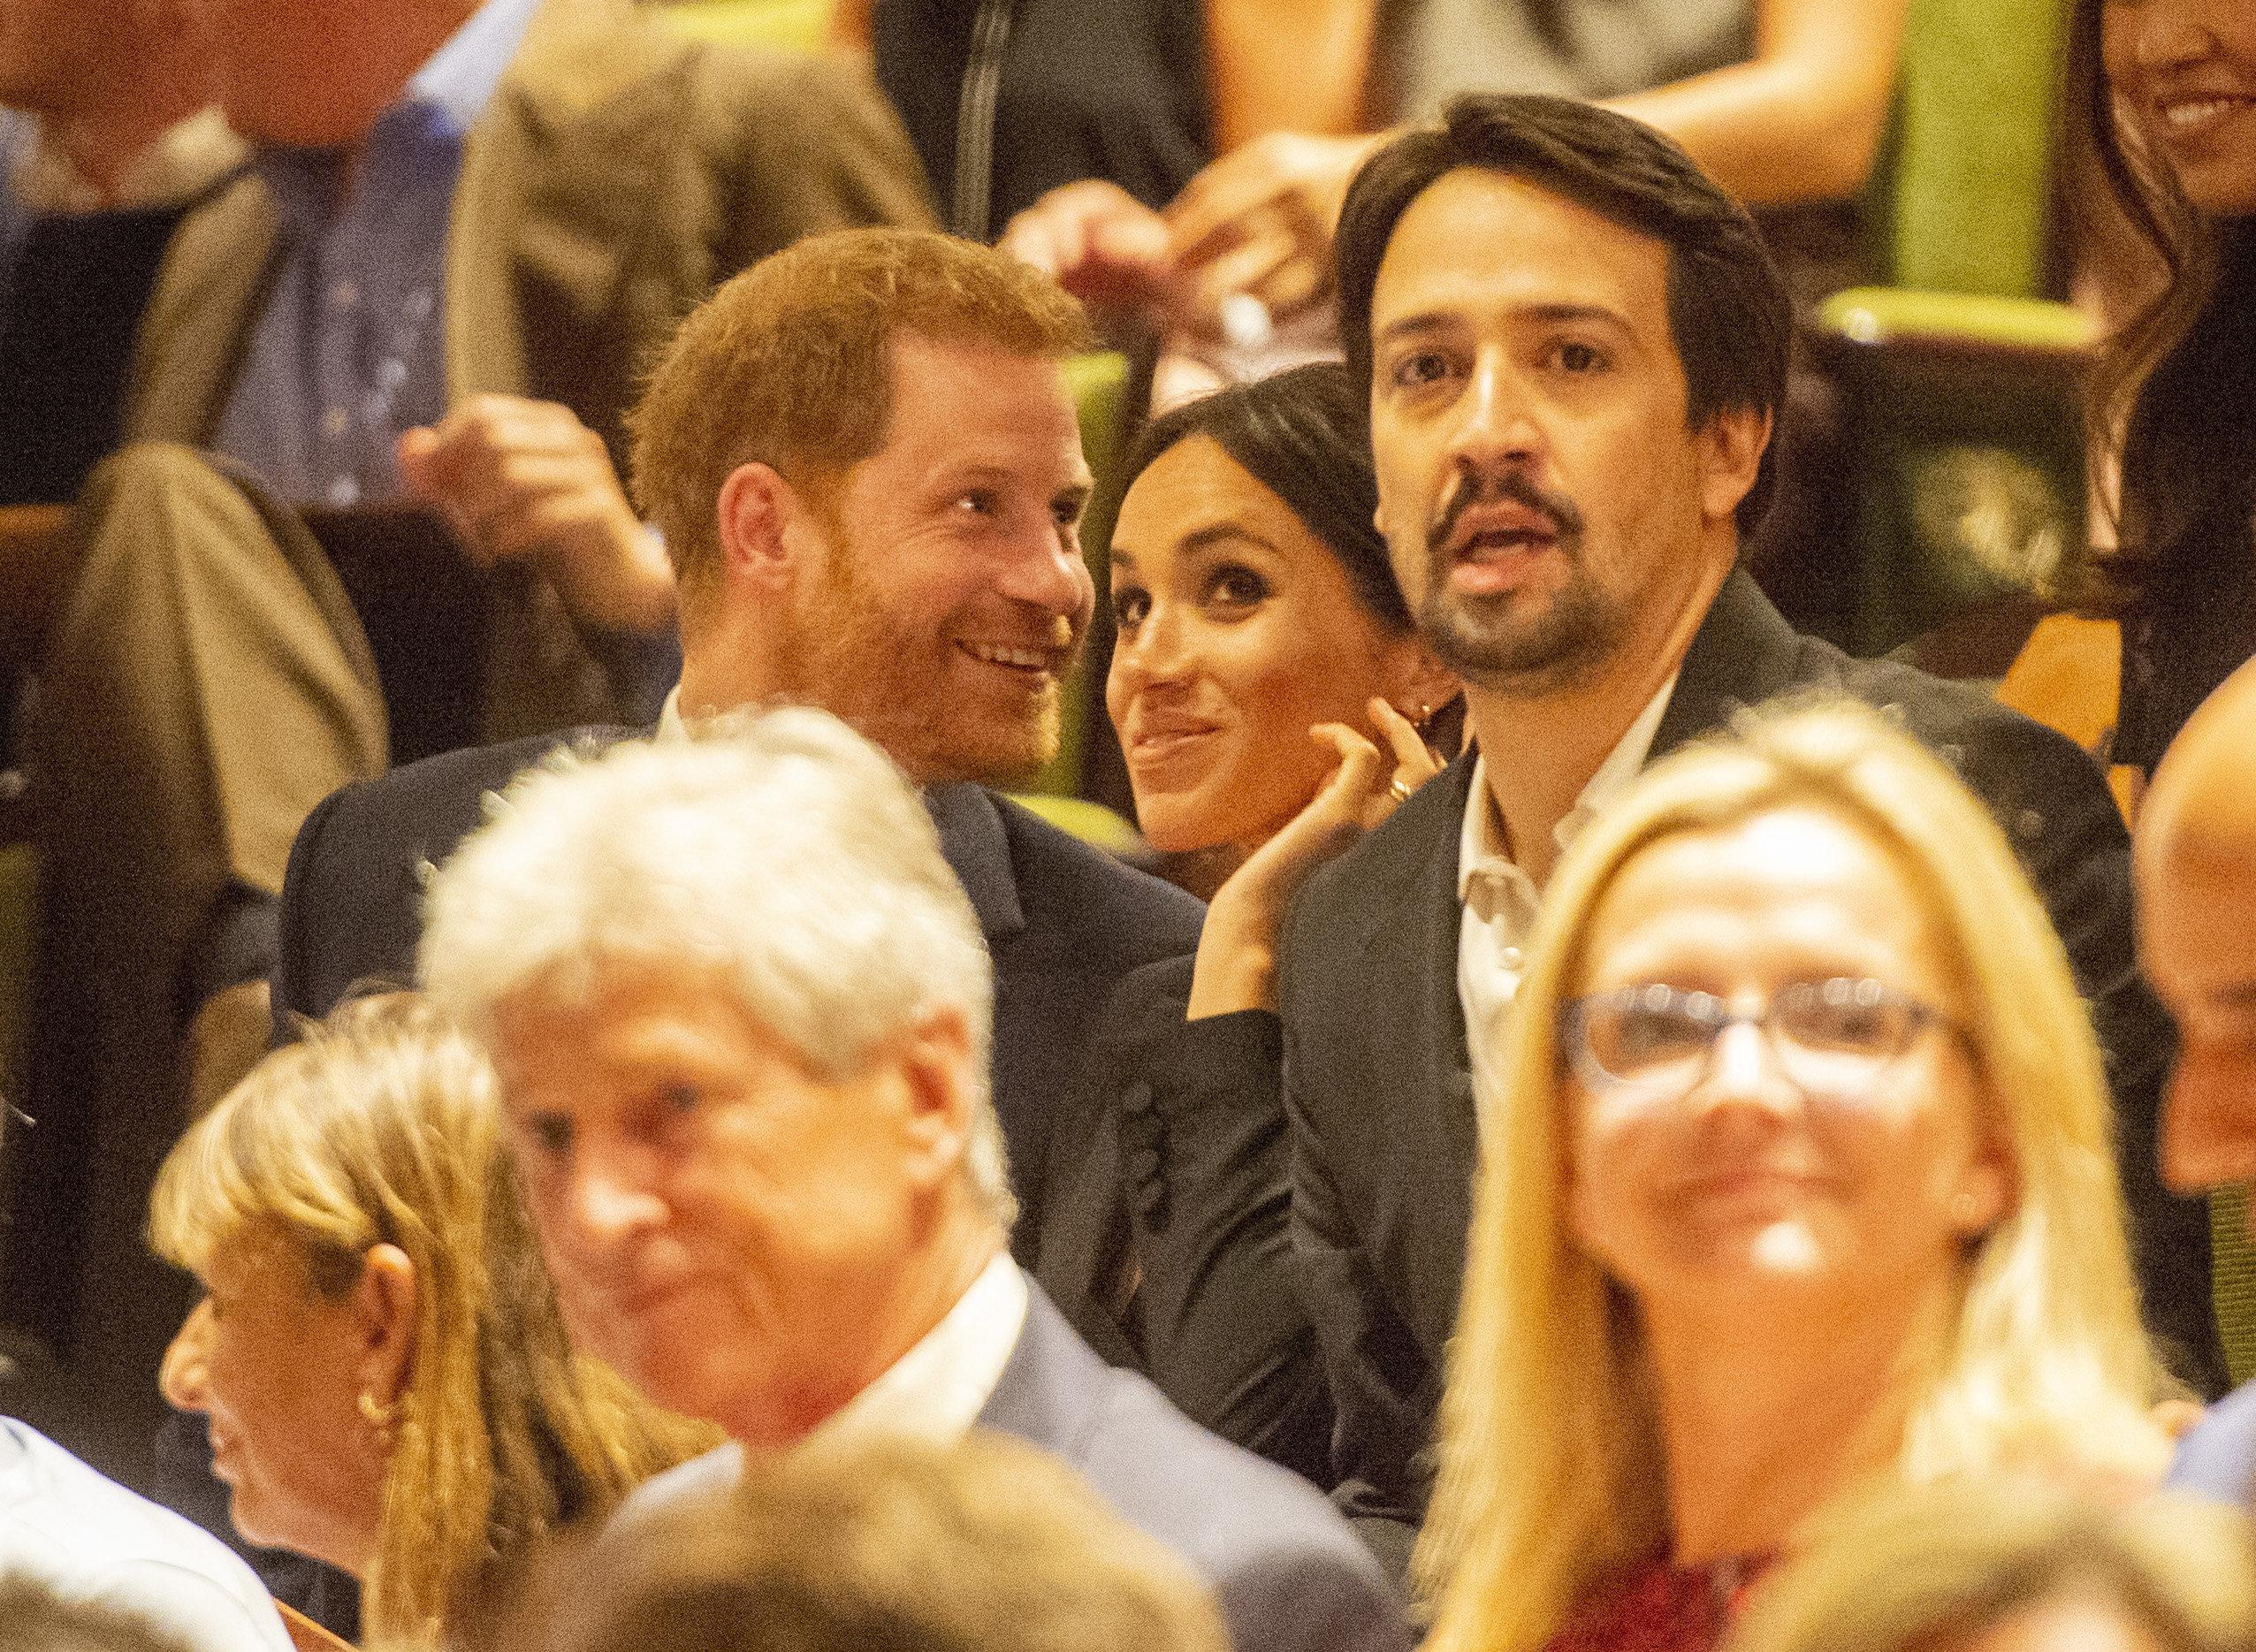 Royals: Herzogin Meghan rutscht Kosenamen für Prinz Harry heraus